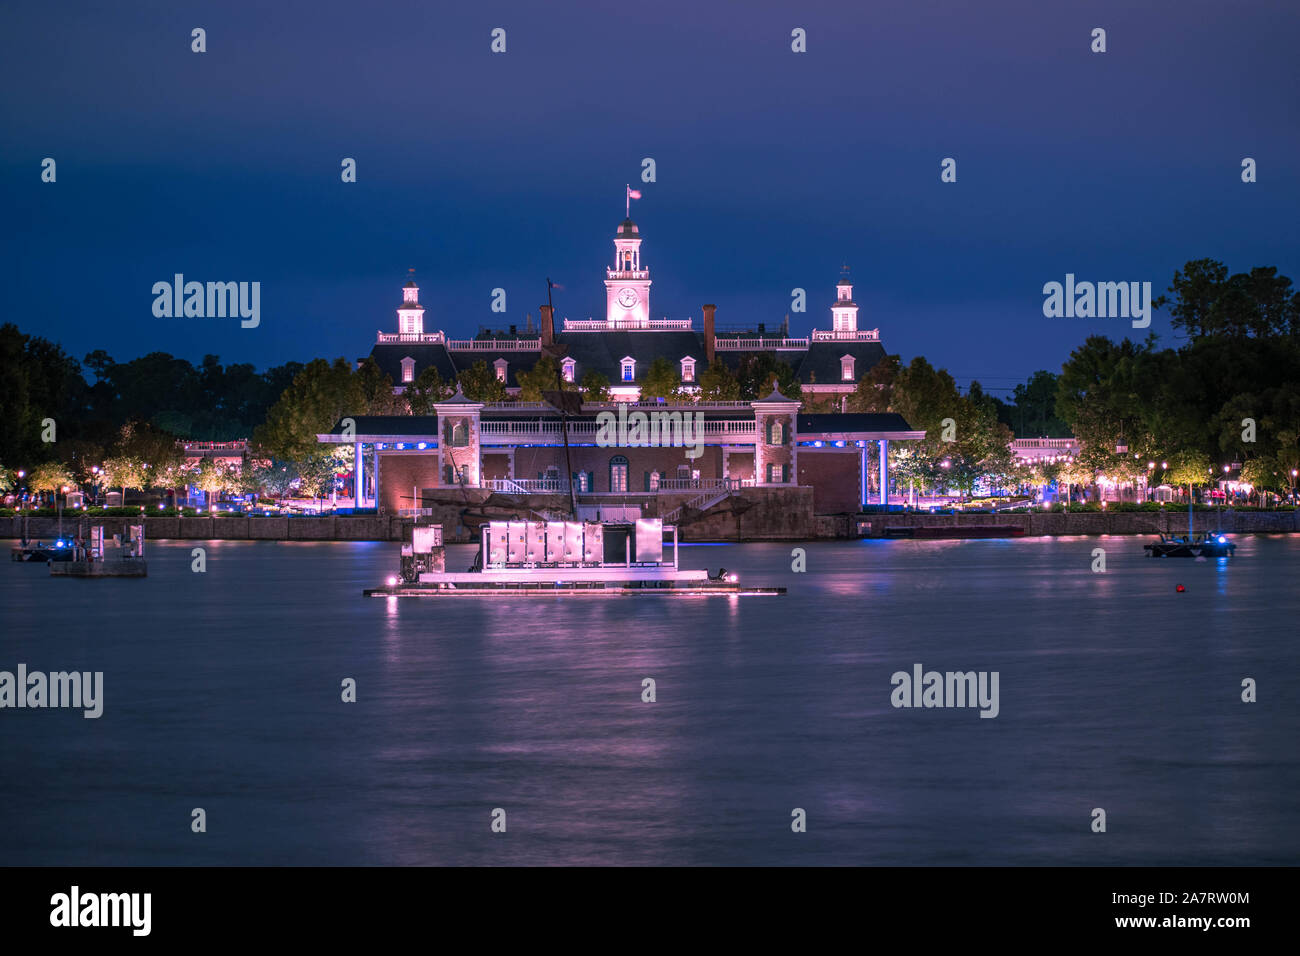 Orlando, Florida. November 01, 2019. The America Adventure Pavillion on blue night background at Epcot (5). Stock Photo